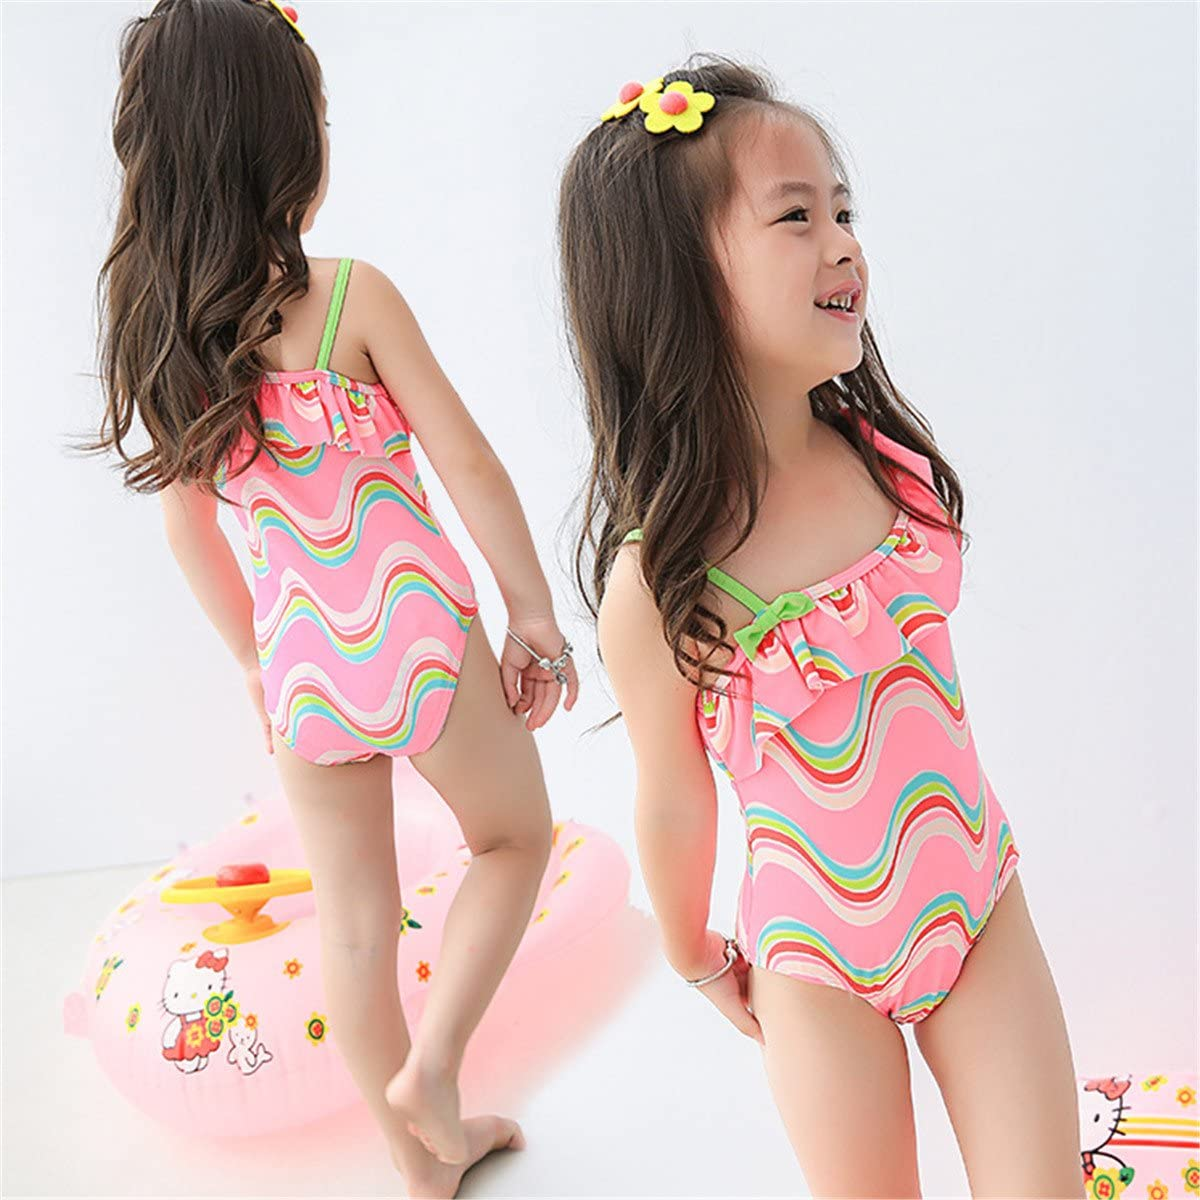 REWANGOING Baby Kids Toddler One Pieces Sleeveless Swimwear Bowknot Stripe Swimsuit Bathing Suits